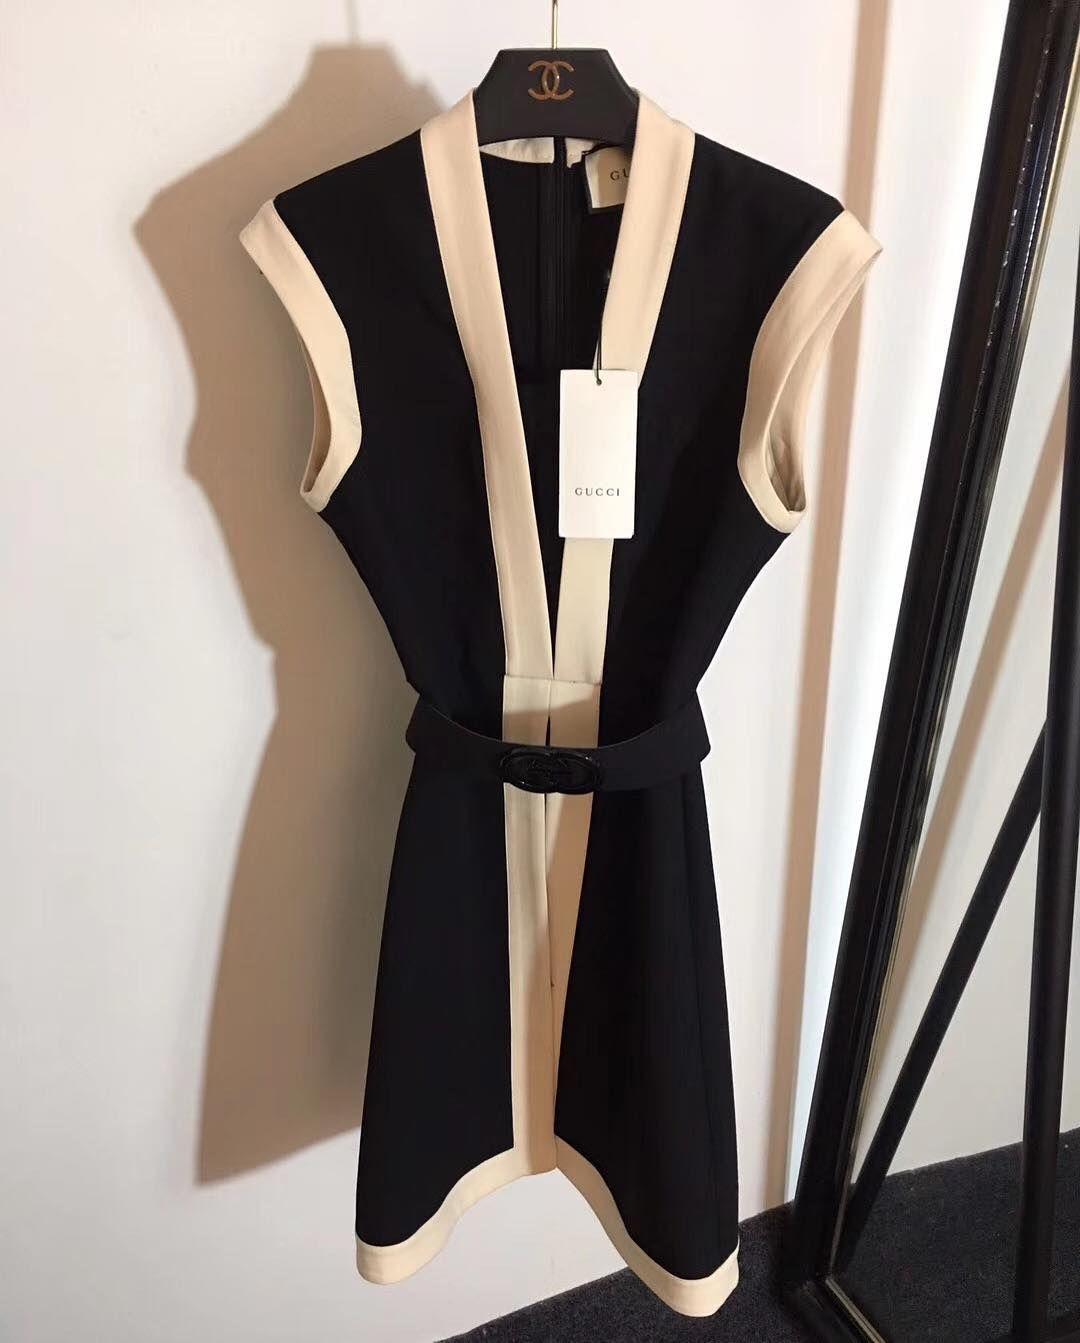 Same Photospost Id9612280brandsguccisize S M L Whatsapp 008615914922112with Shippingdhl Aramex Ems Luxury Luxurybra Fashion Dress Details Little Black Dress